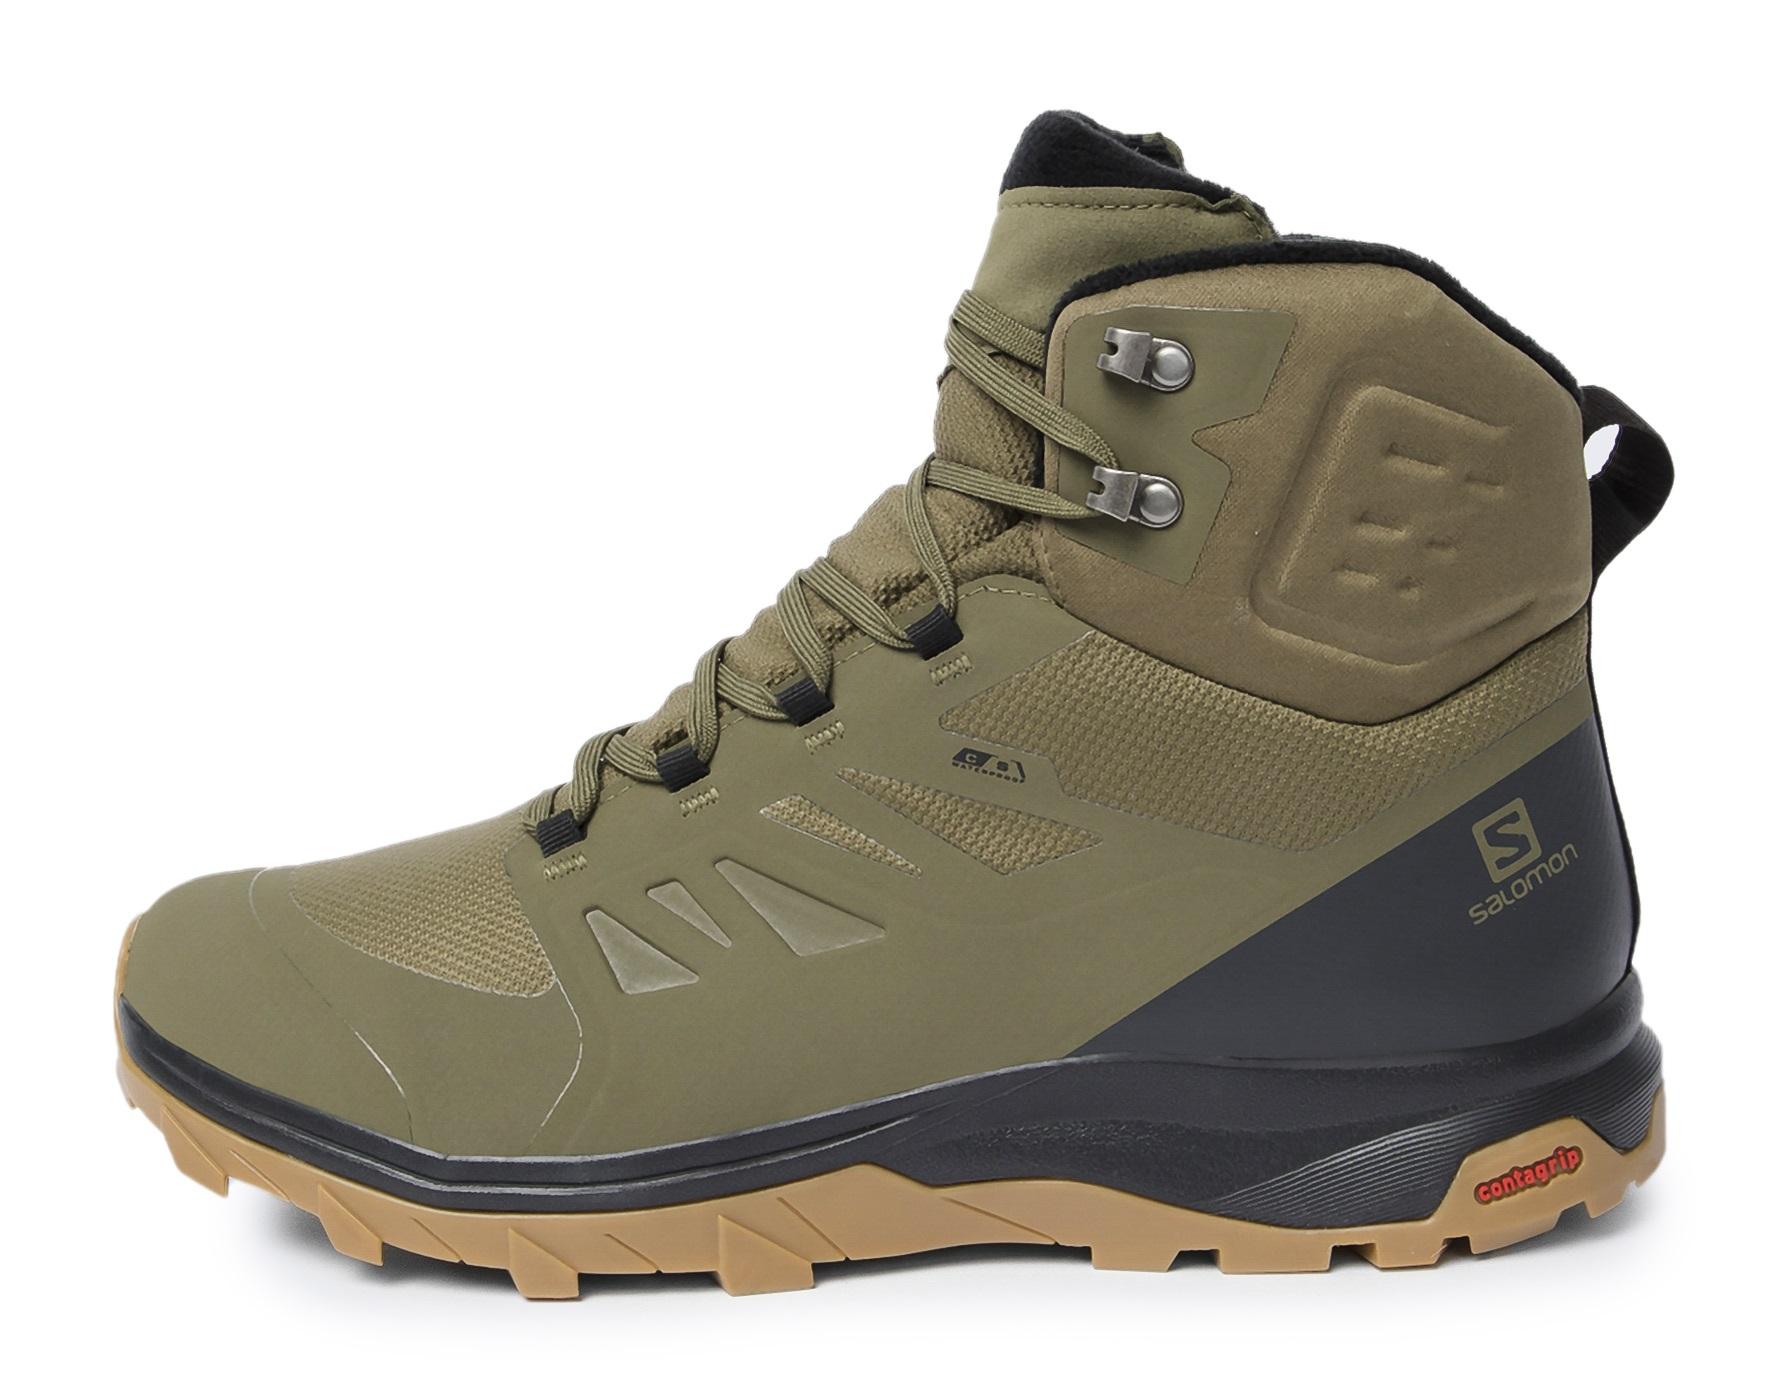 Salomon Ботинки утепленные мужские Salomon Outblast, размер 41 salomon ботинки утепленные мужские salomon crusano размер 40